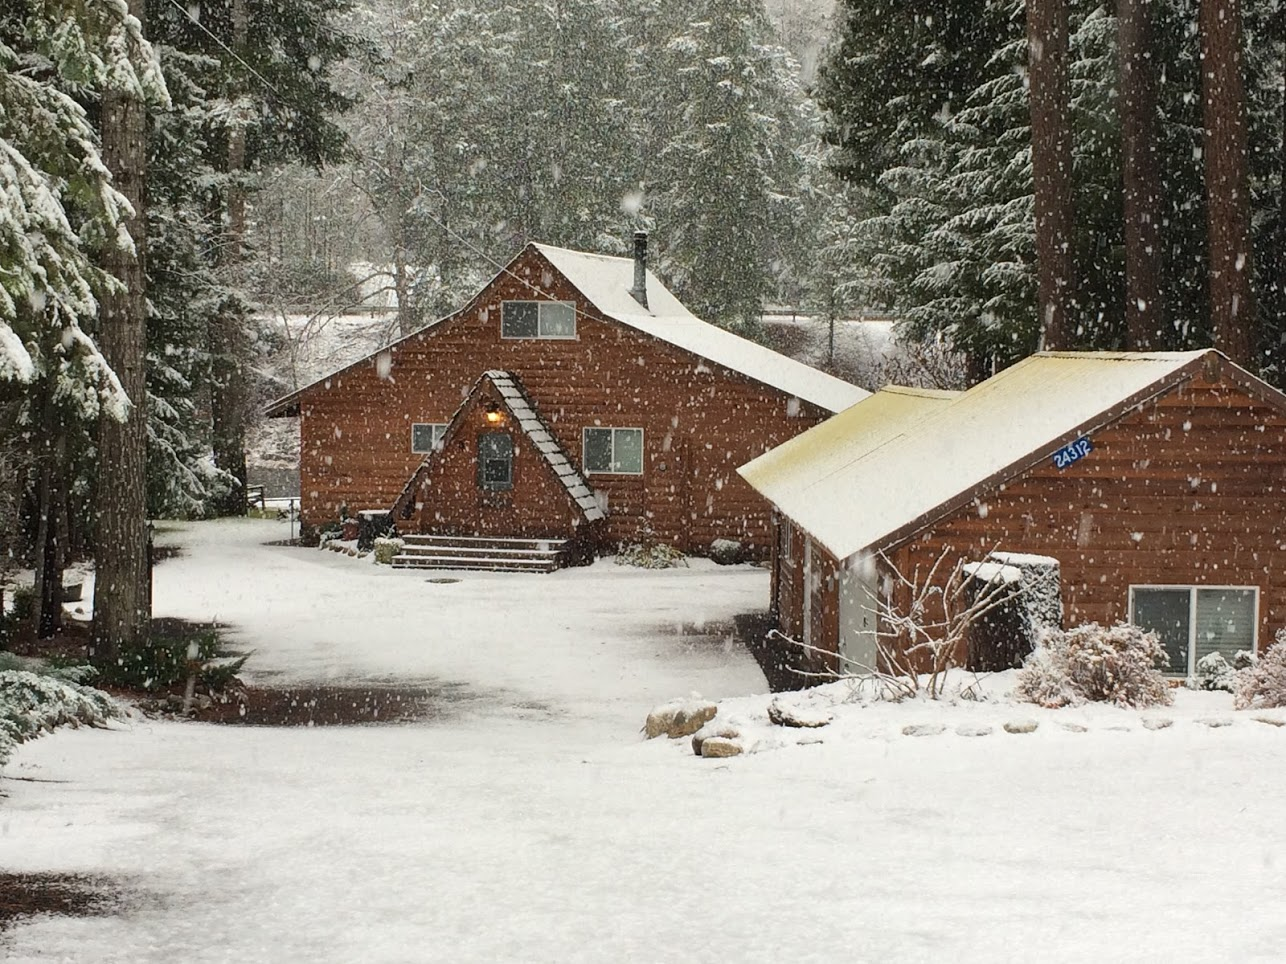 Snow at cabin